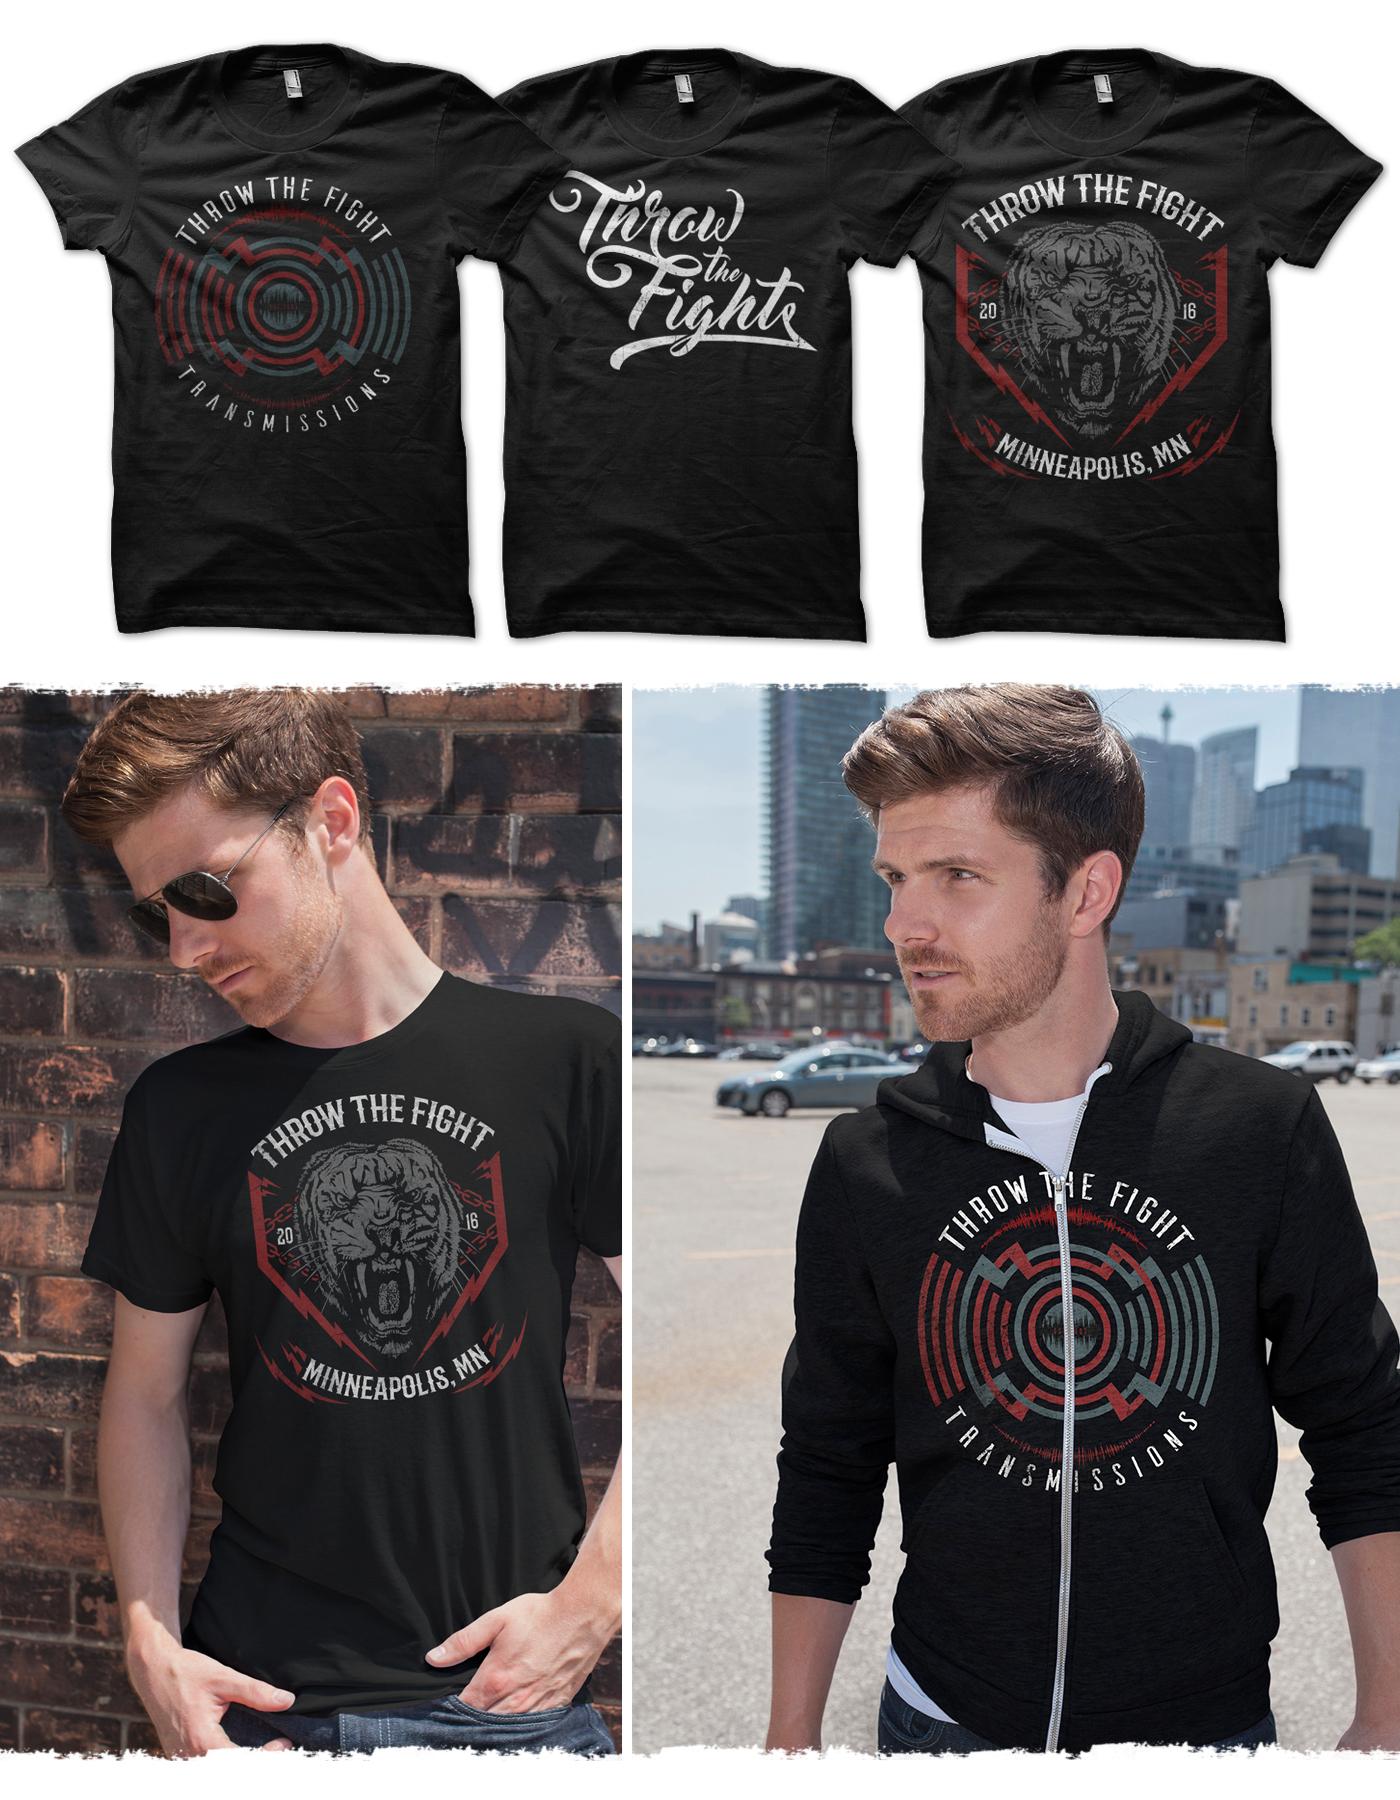 Throw The Fight merchandise designs